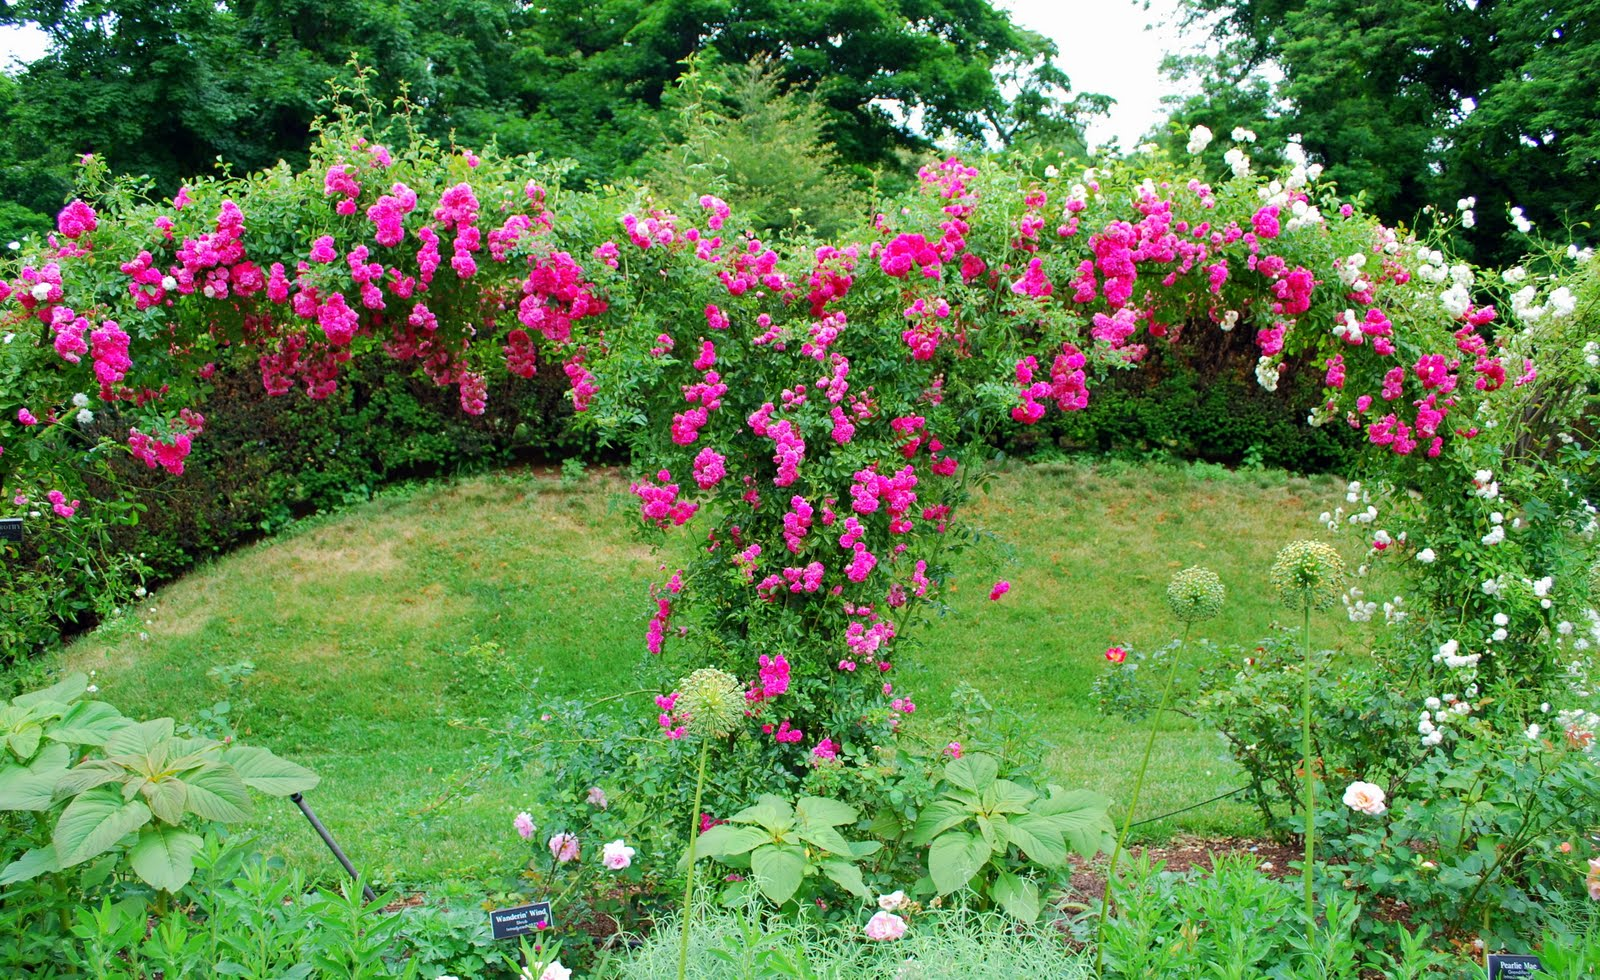 Mille Fiori Favoriti: Pink Roses in the Cranford Rose Garden